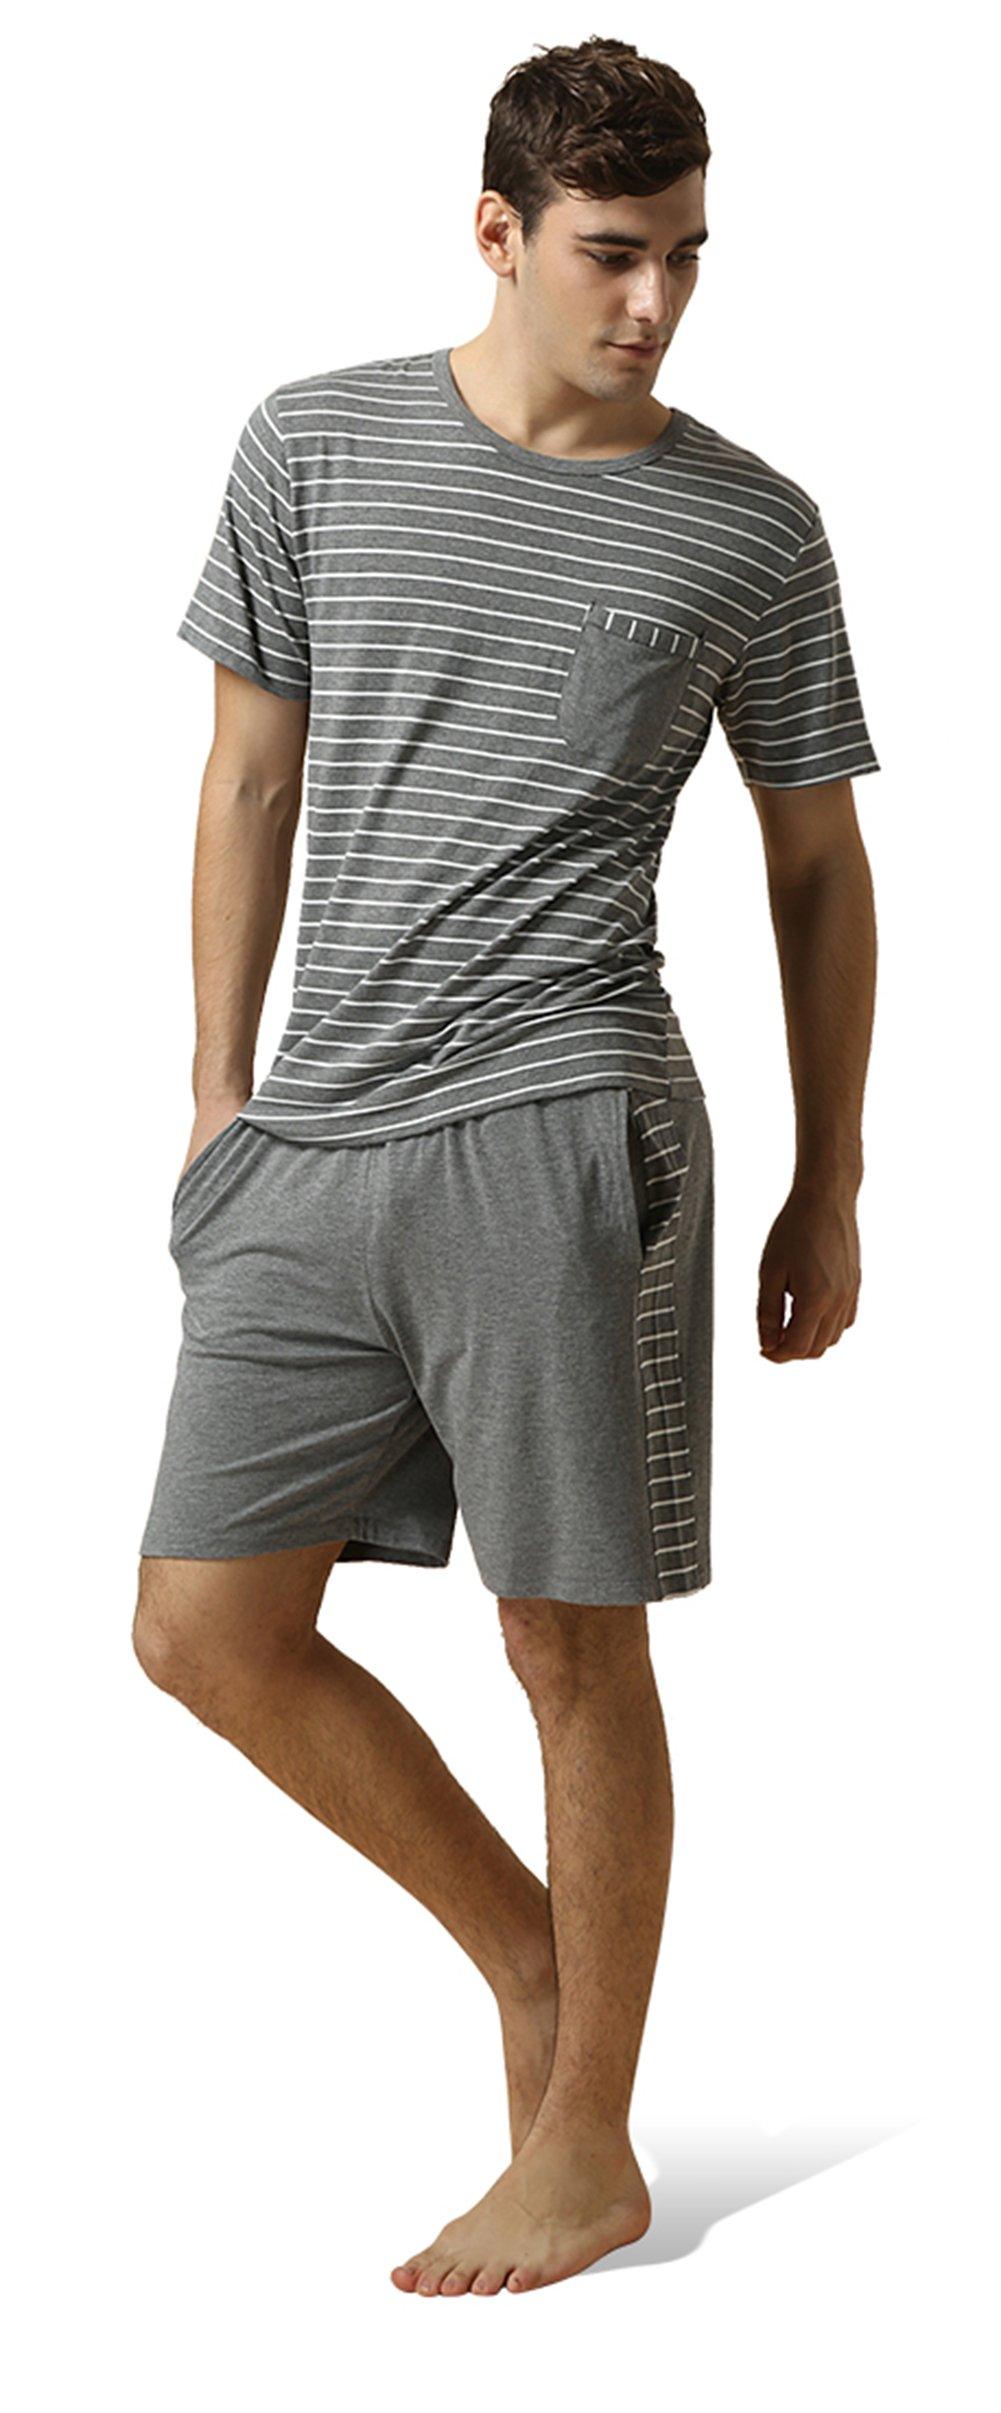 QIANXIU Men's Summer Short Sleeve Pajamas Casual Striped Shorts & Shirt PJ Set, Grey, Large